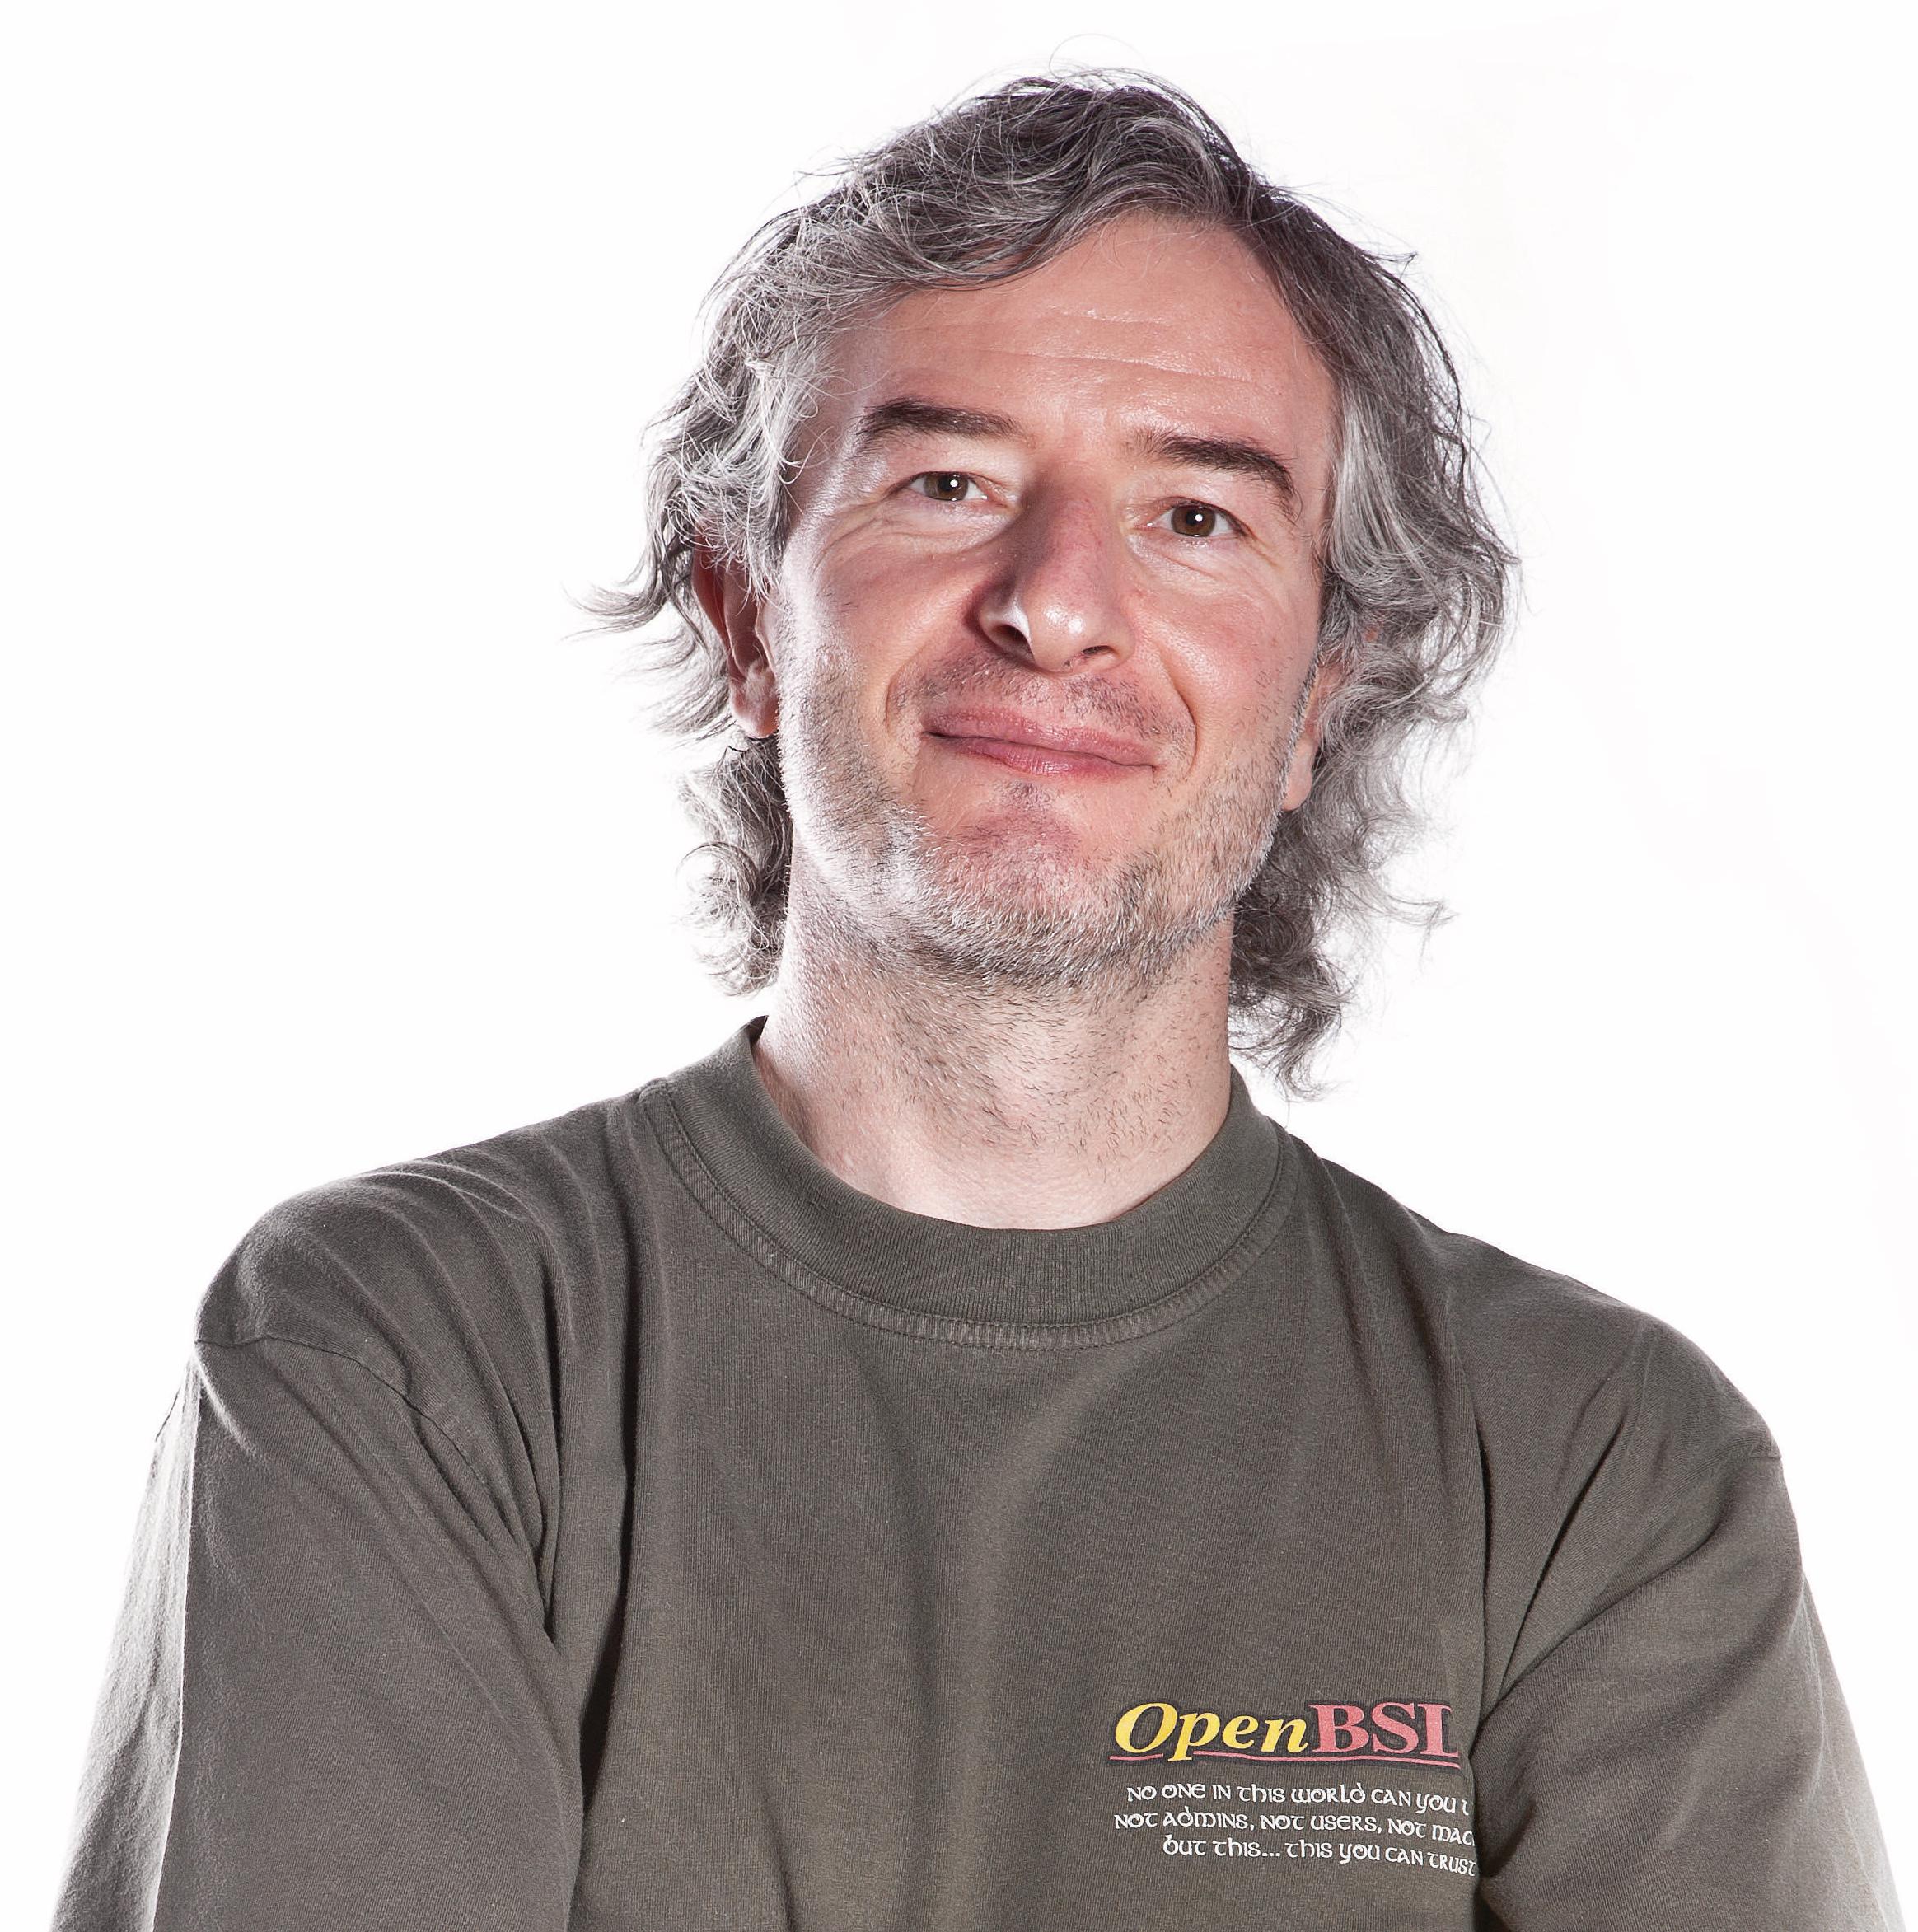 Lucio Bragagnolo